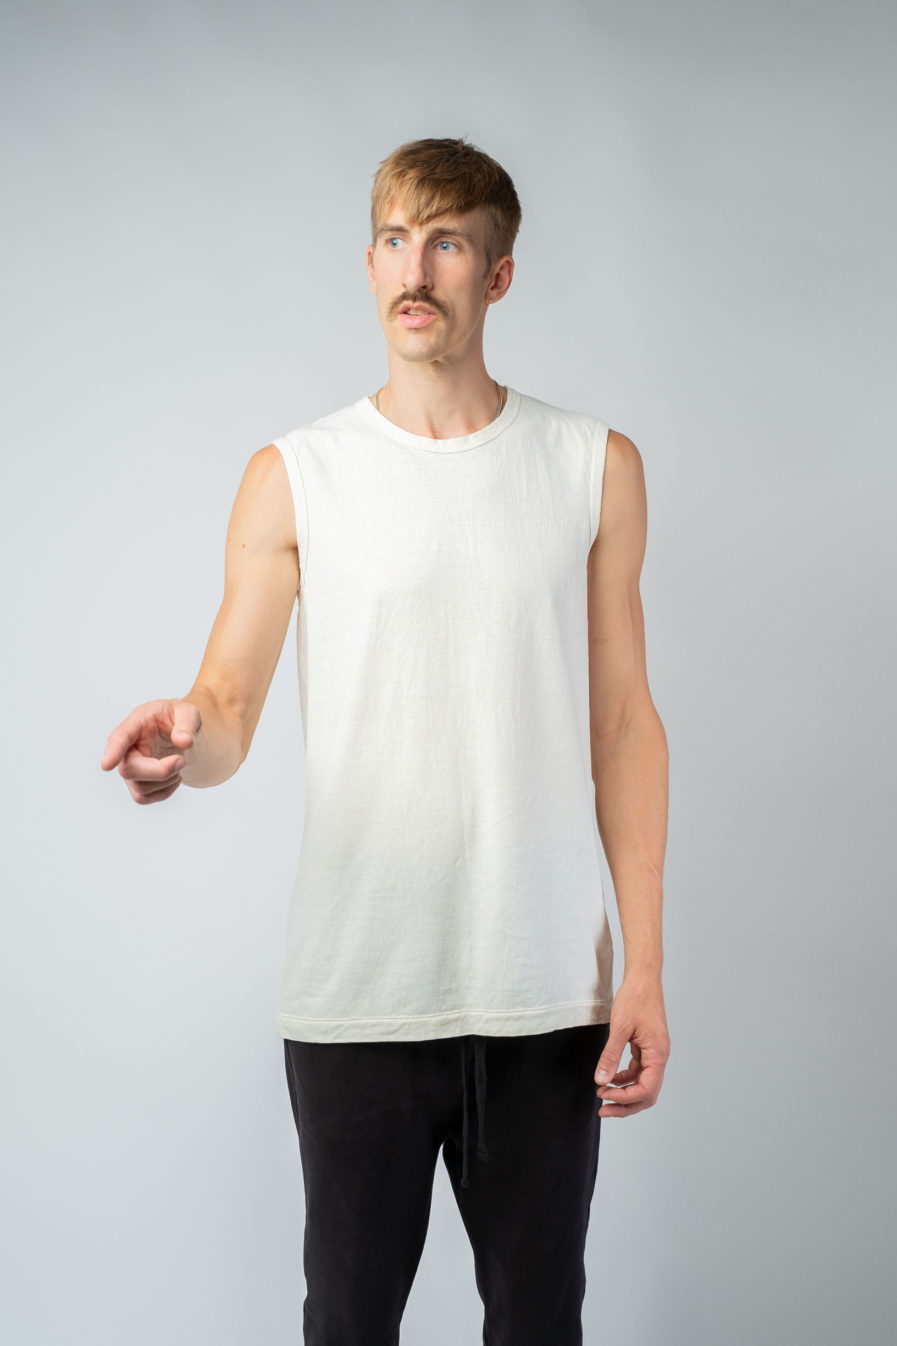 MAN unisex singlet tanktop hemp organic cotton VALENTIJN Blank canvas front2